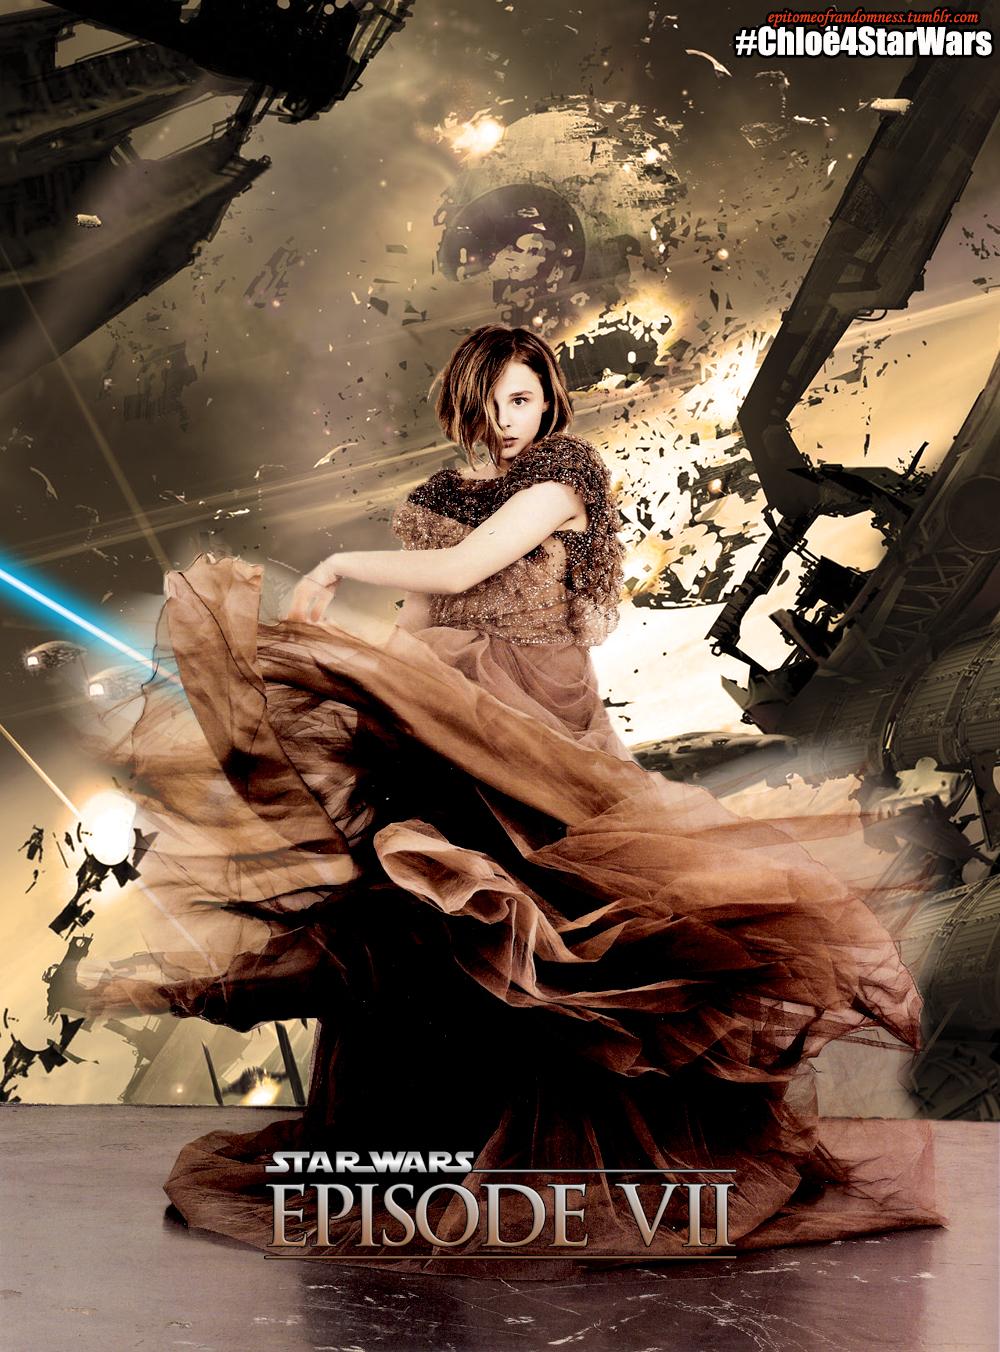 1393592635366_Debris_Dance.jpg